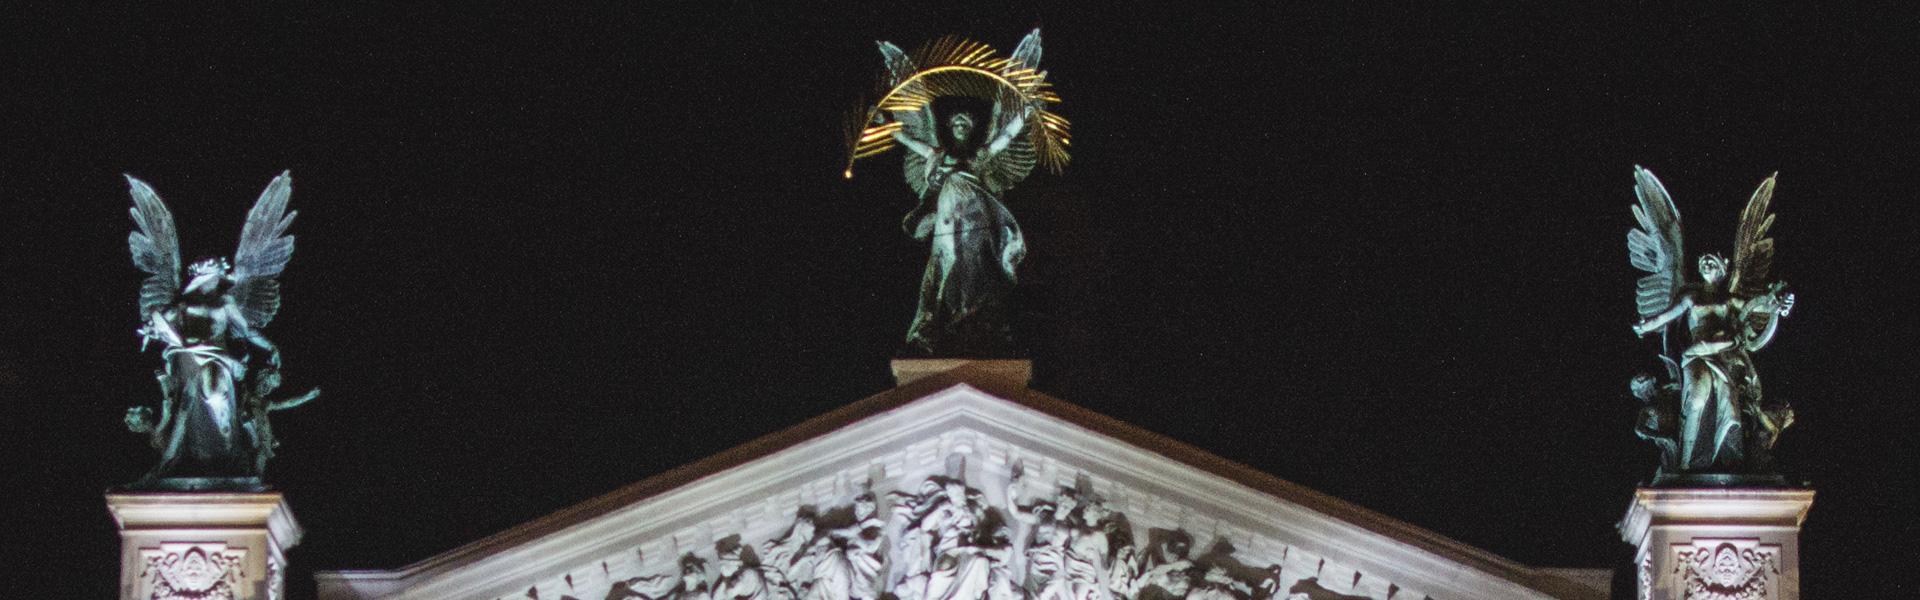 Wiener Oper nachts beleuchtet